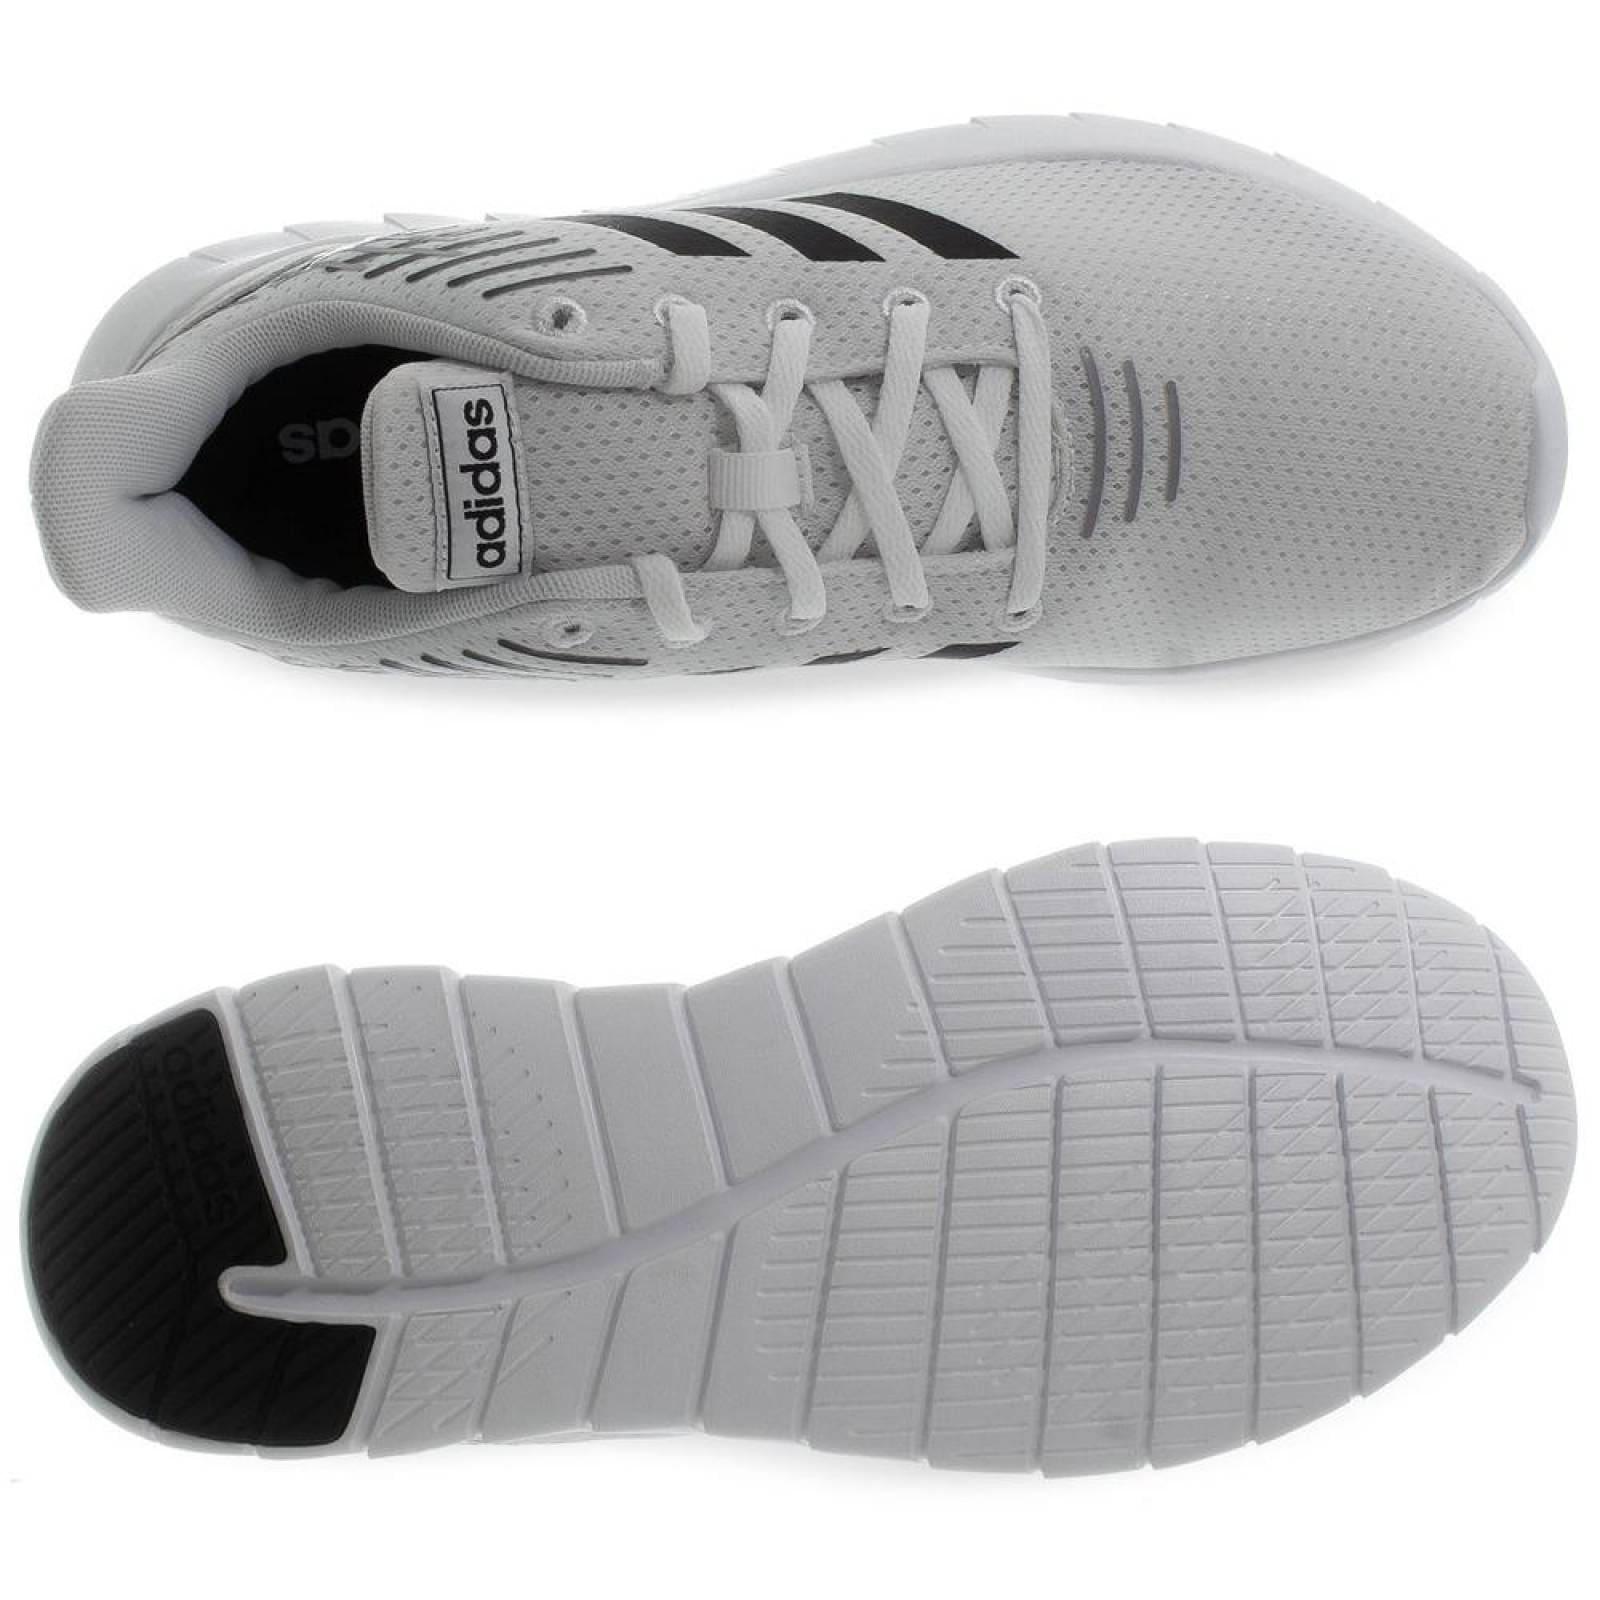 Tenis Adidas Asweerun F36332 Blanco Hombre